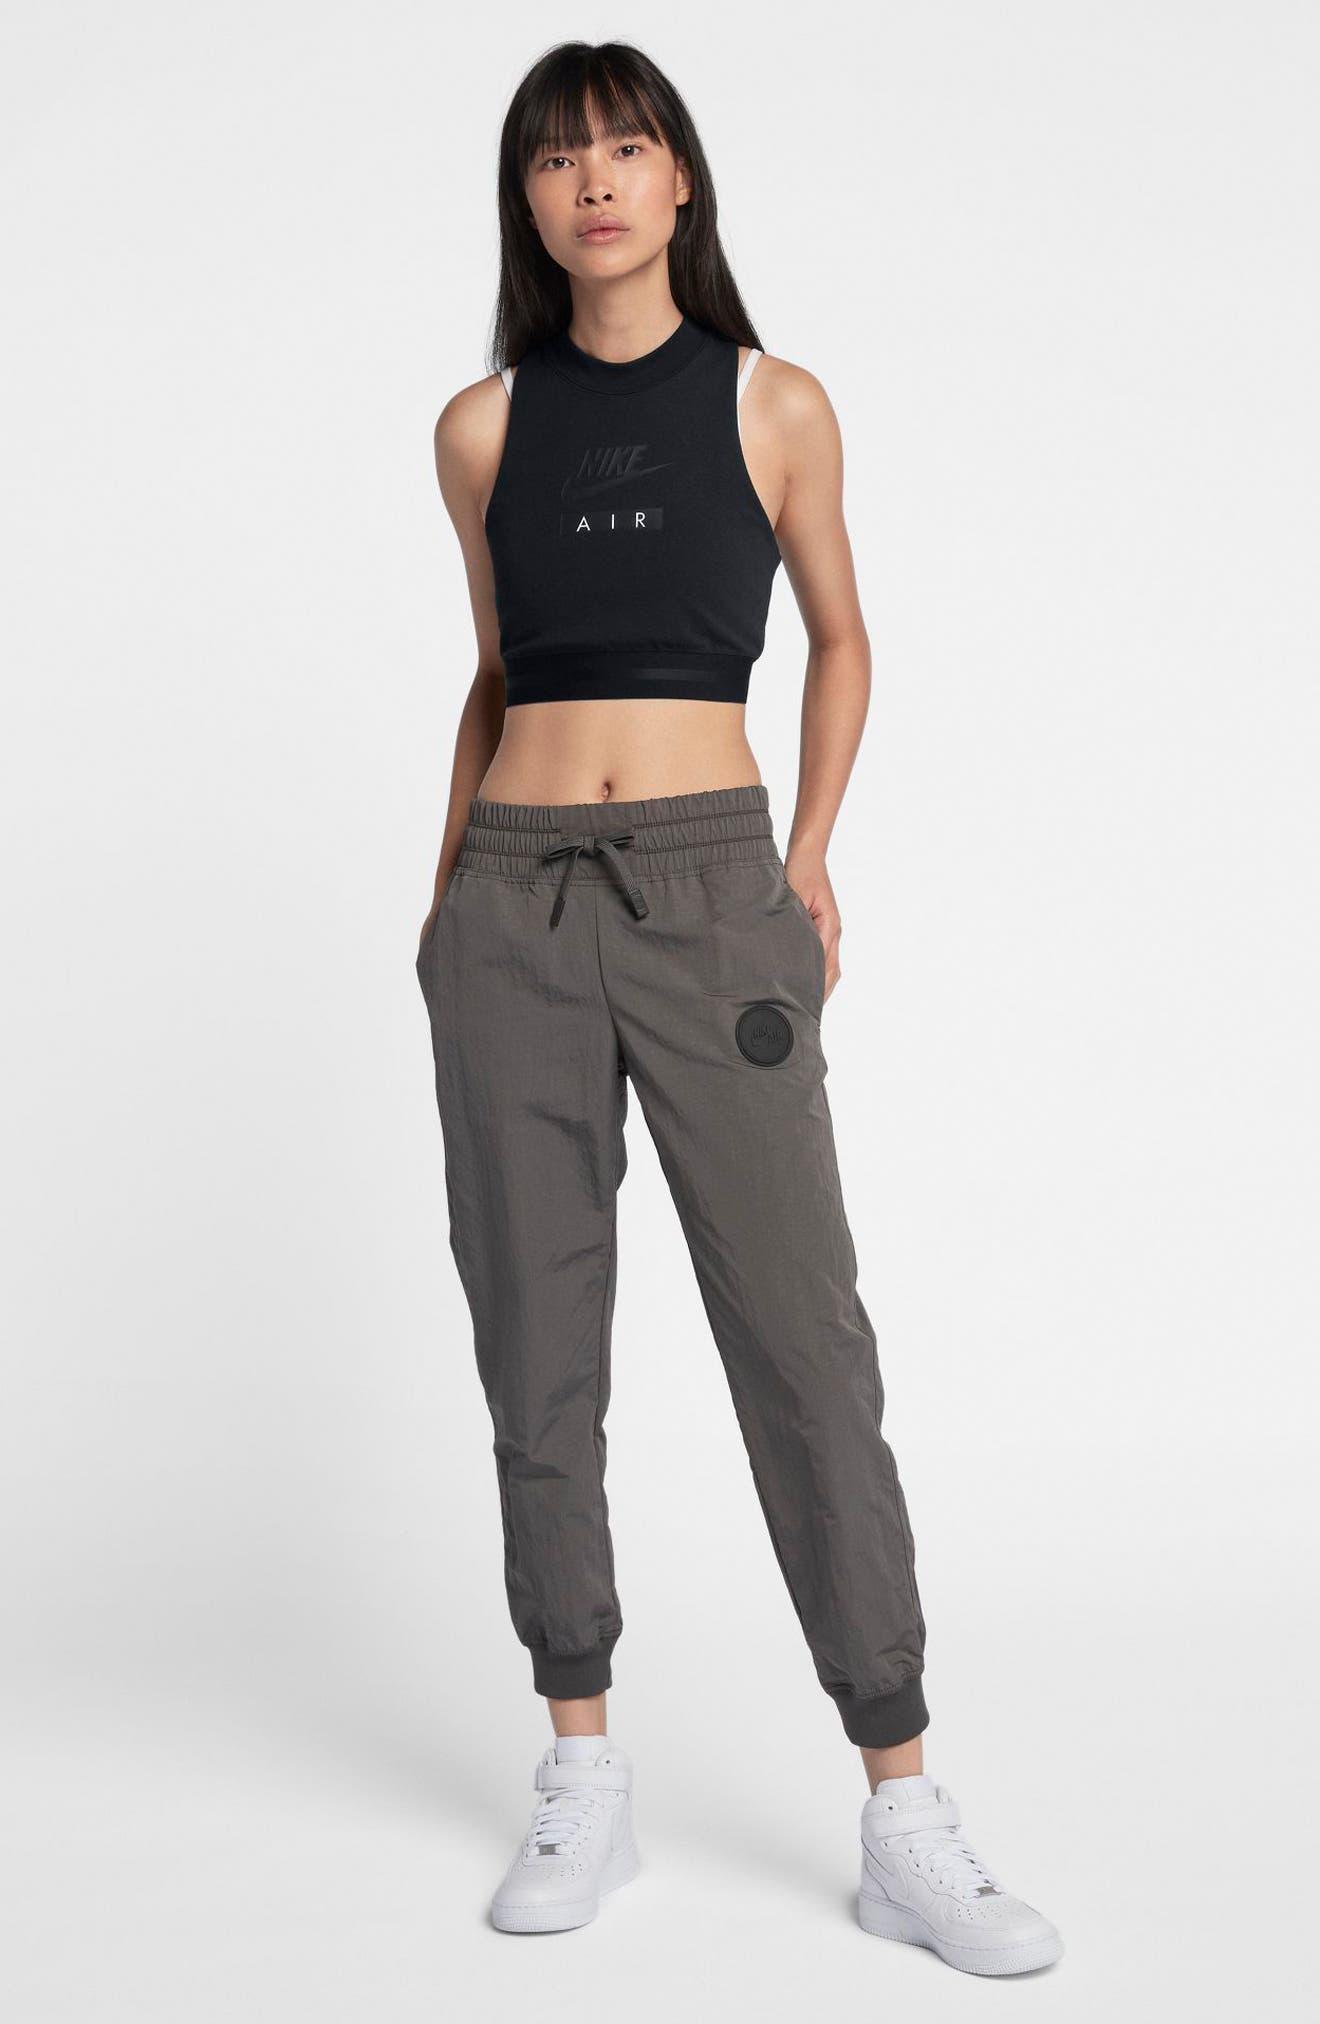 Sportswear Air Women's Crop Top,                             Alternate thumbnail 4, color,                             010